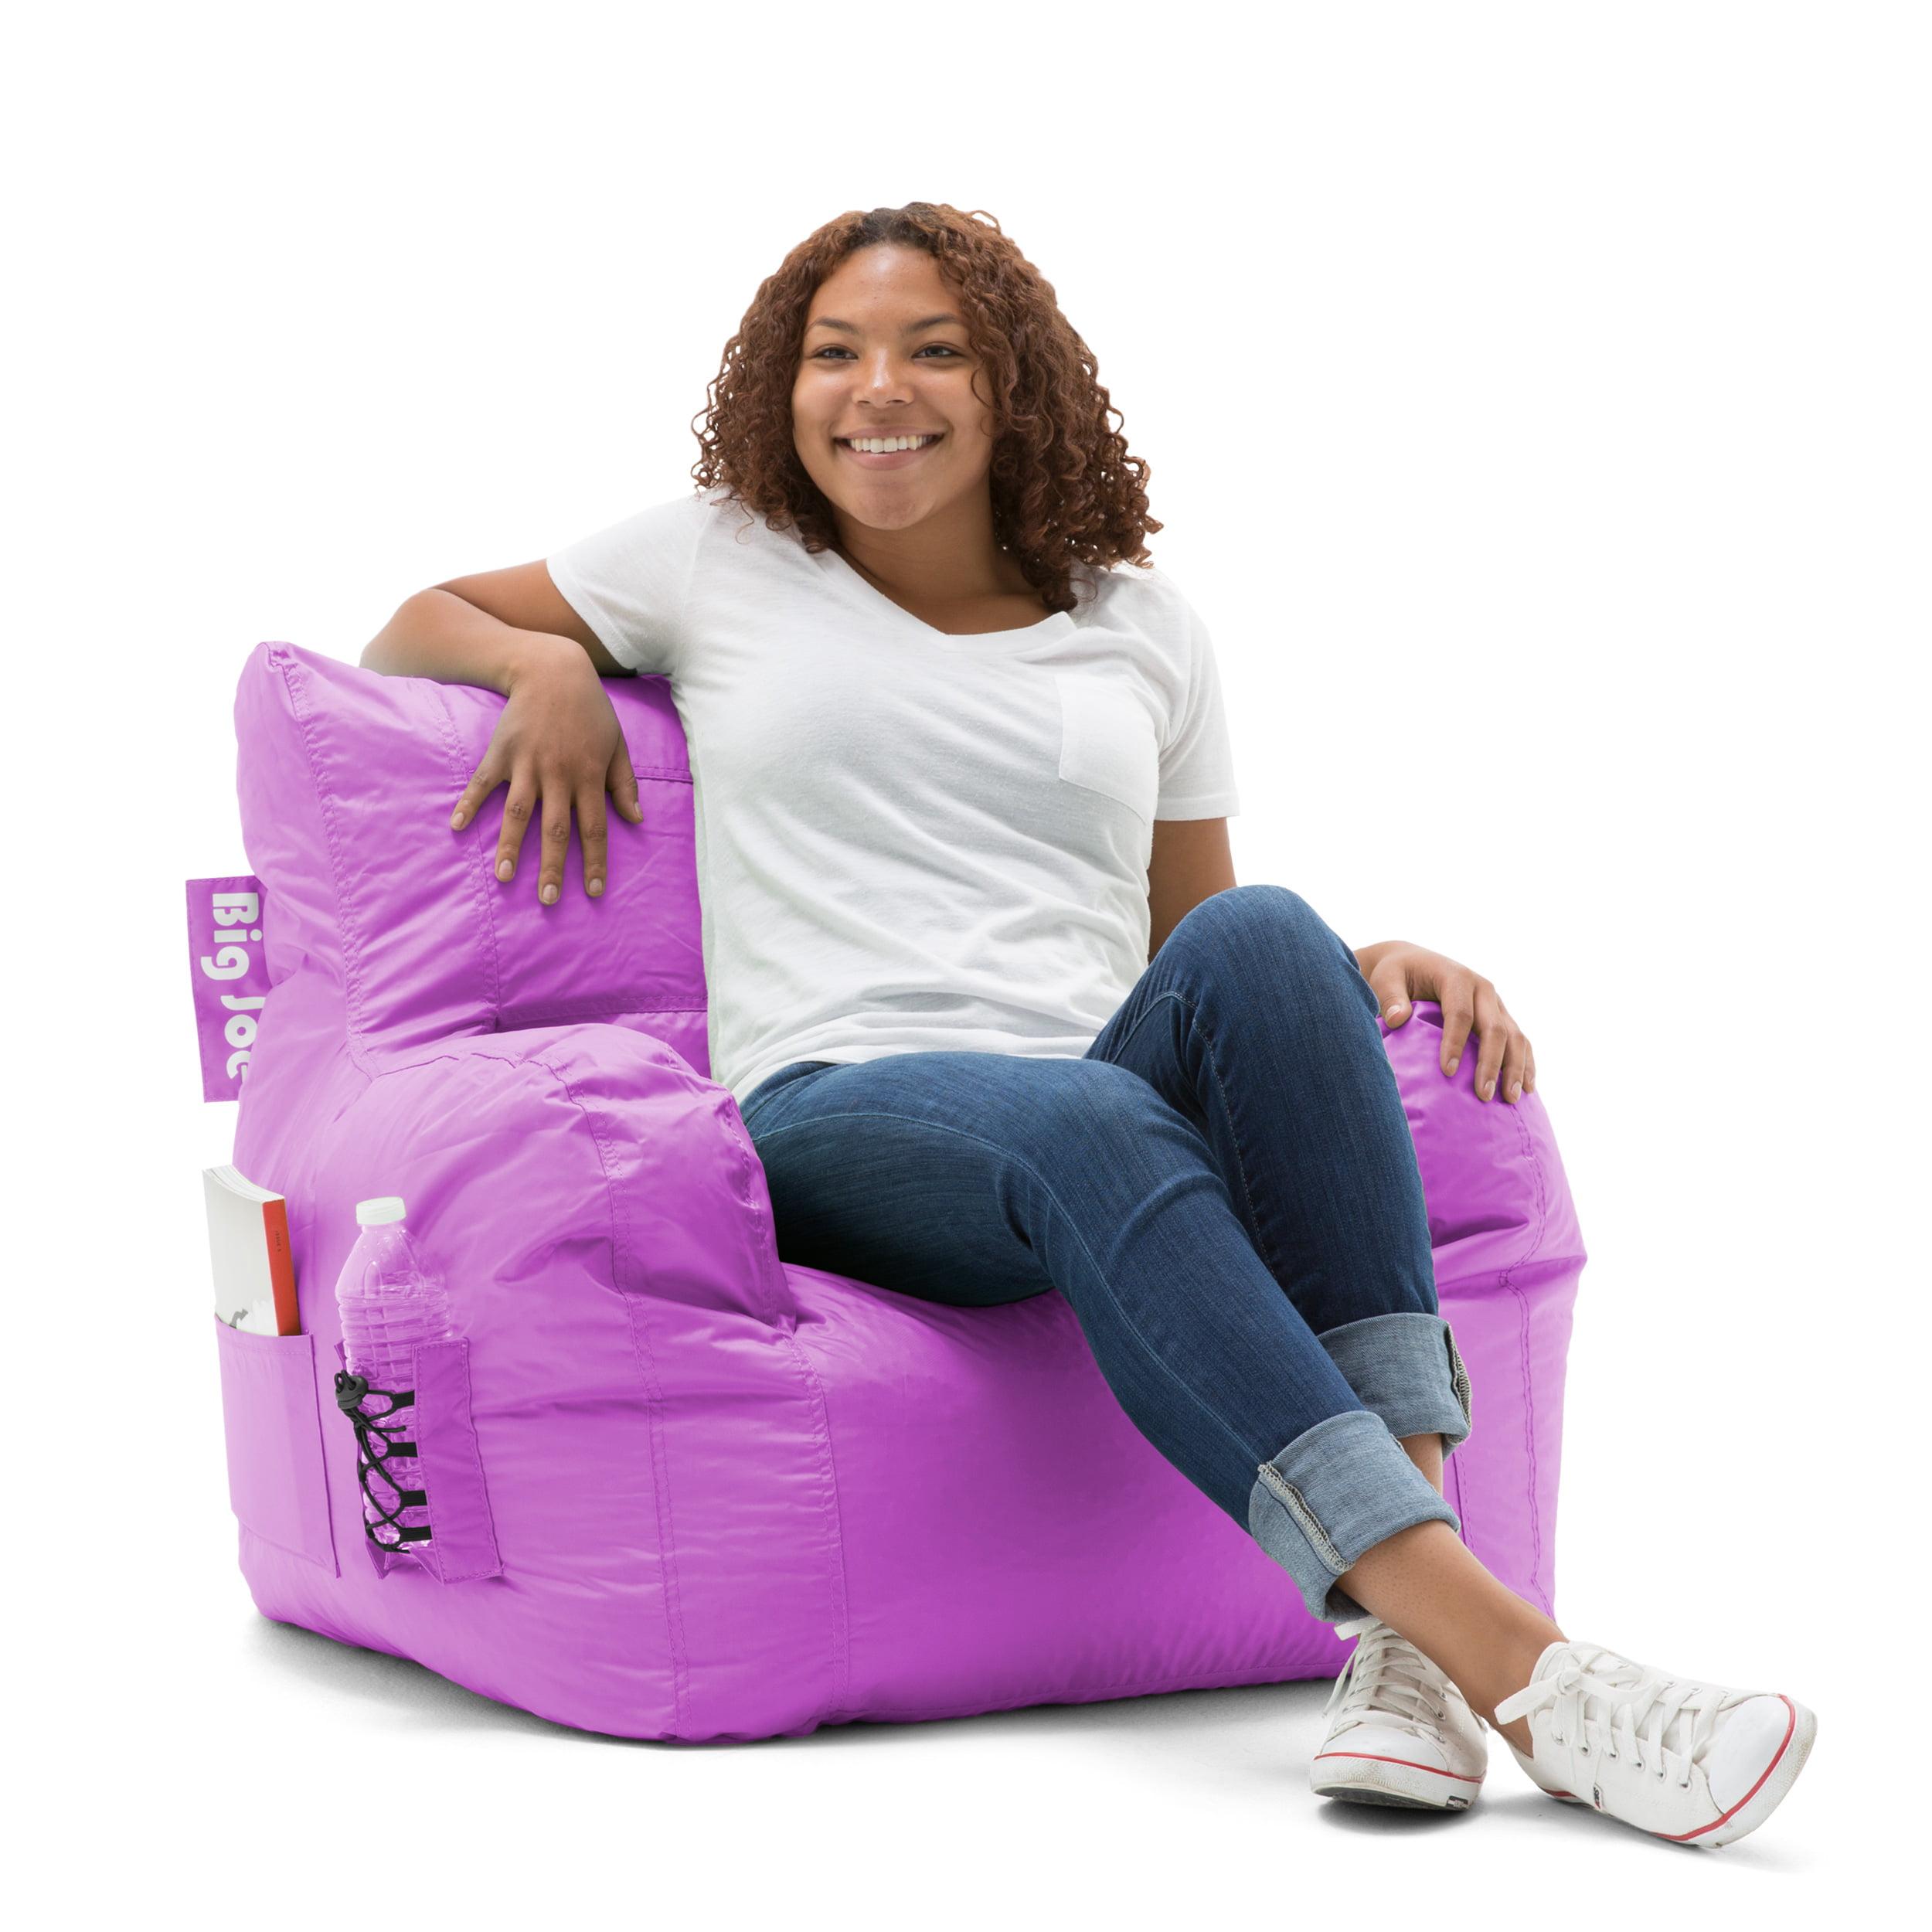 Enjoyable Big Joe Bean Bag Chair Multiple Colors 33 X 32 X 25 Ncnpc Chair Design For Home Ncnpcorg